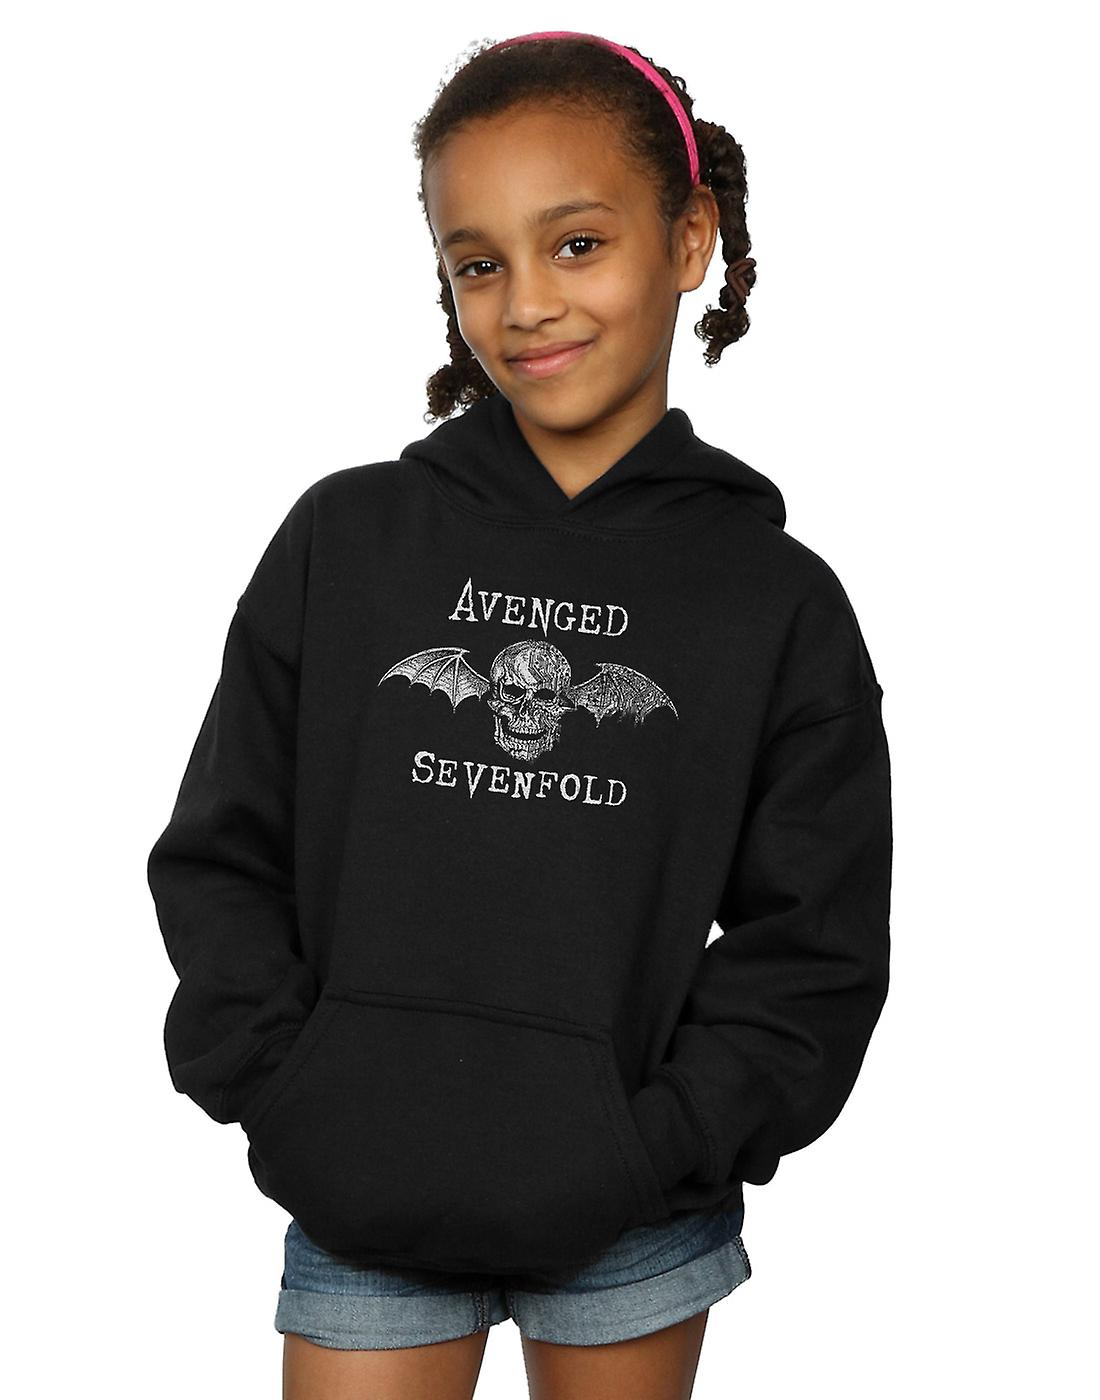 Avenged Sevenfold Girls Cyborg Deathbat Hoodie